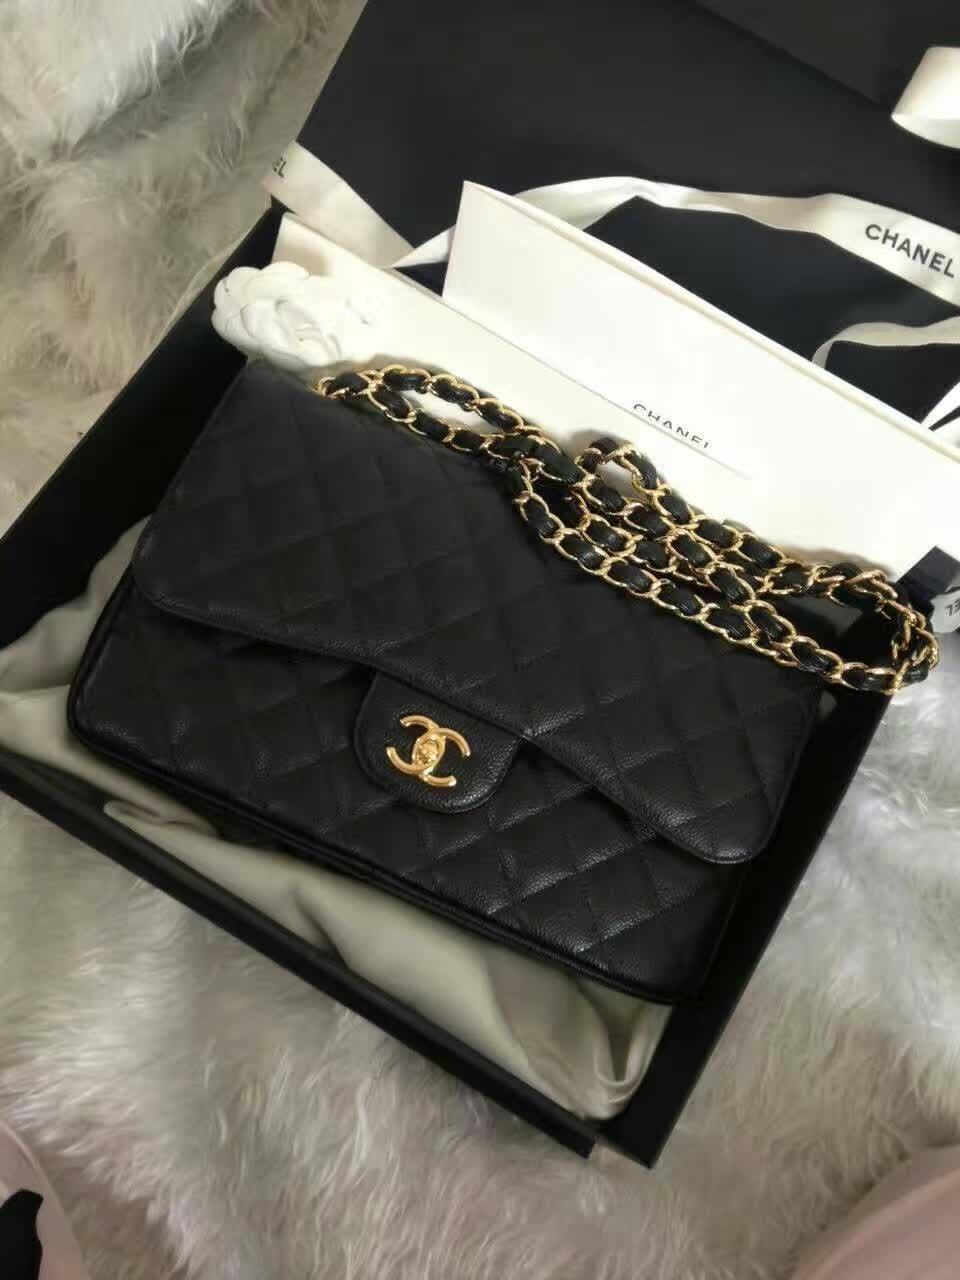 BNIB Authentic Chanel Black Jumbo Caviar Double Flap Bag Gold Hardware